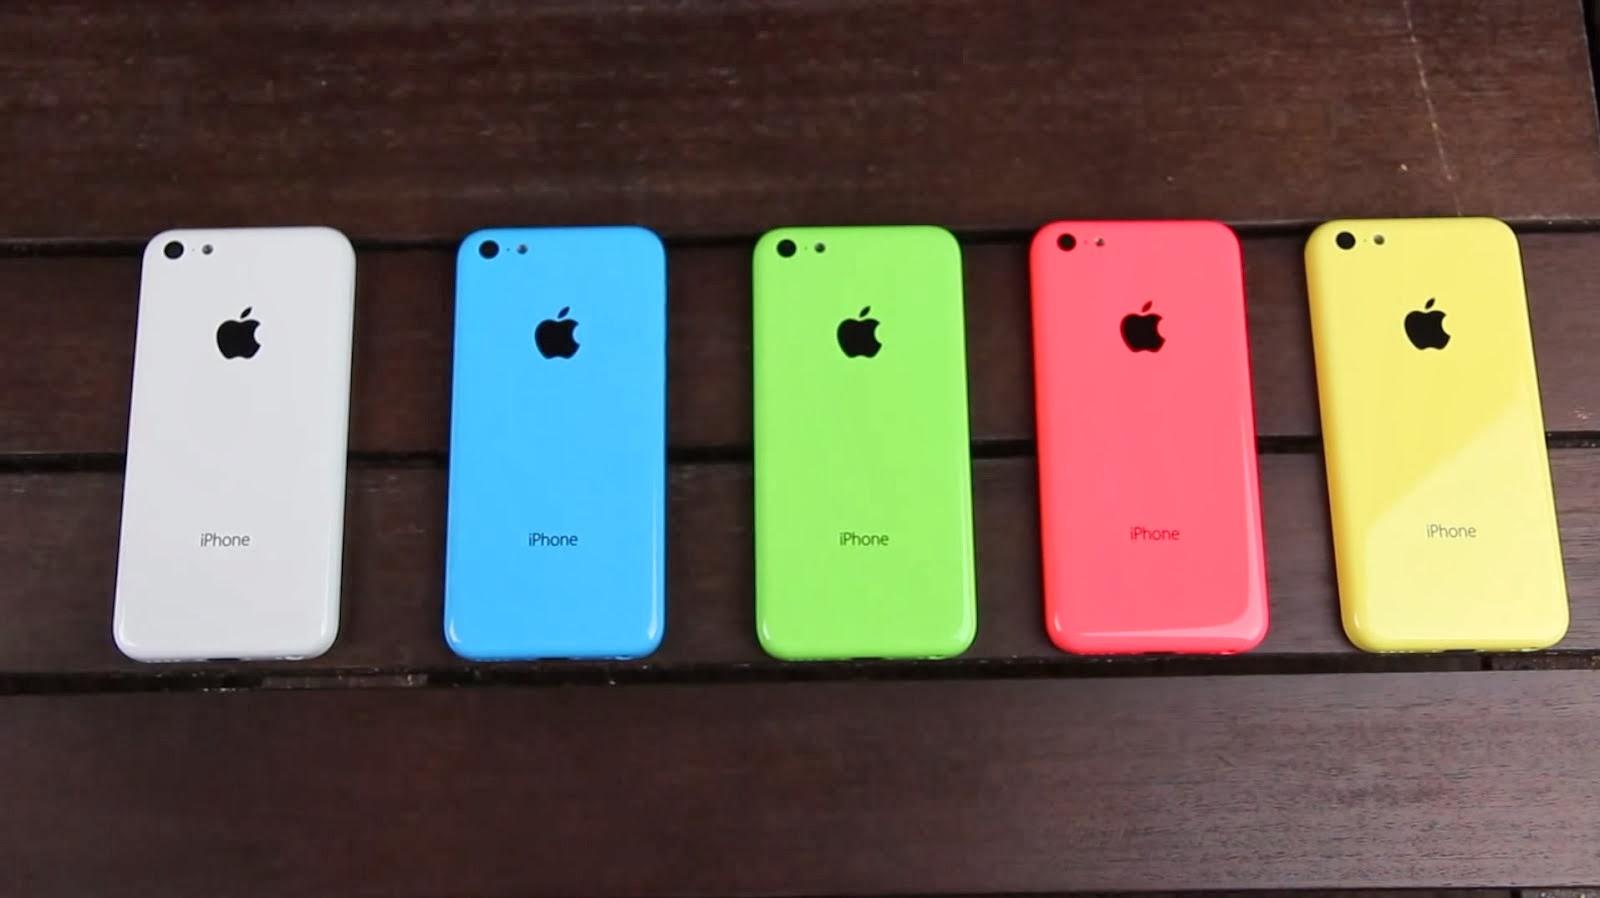 iPhone 5c Latest Colours!